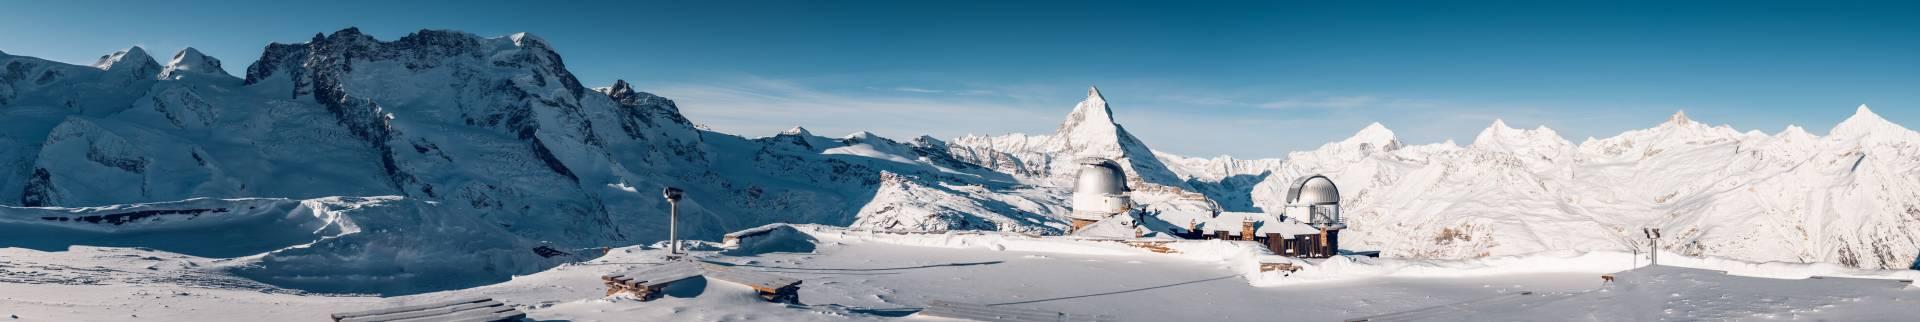 Panorama depuis le Gornergrat en hiver